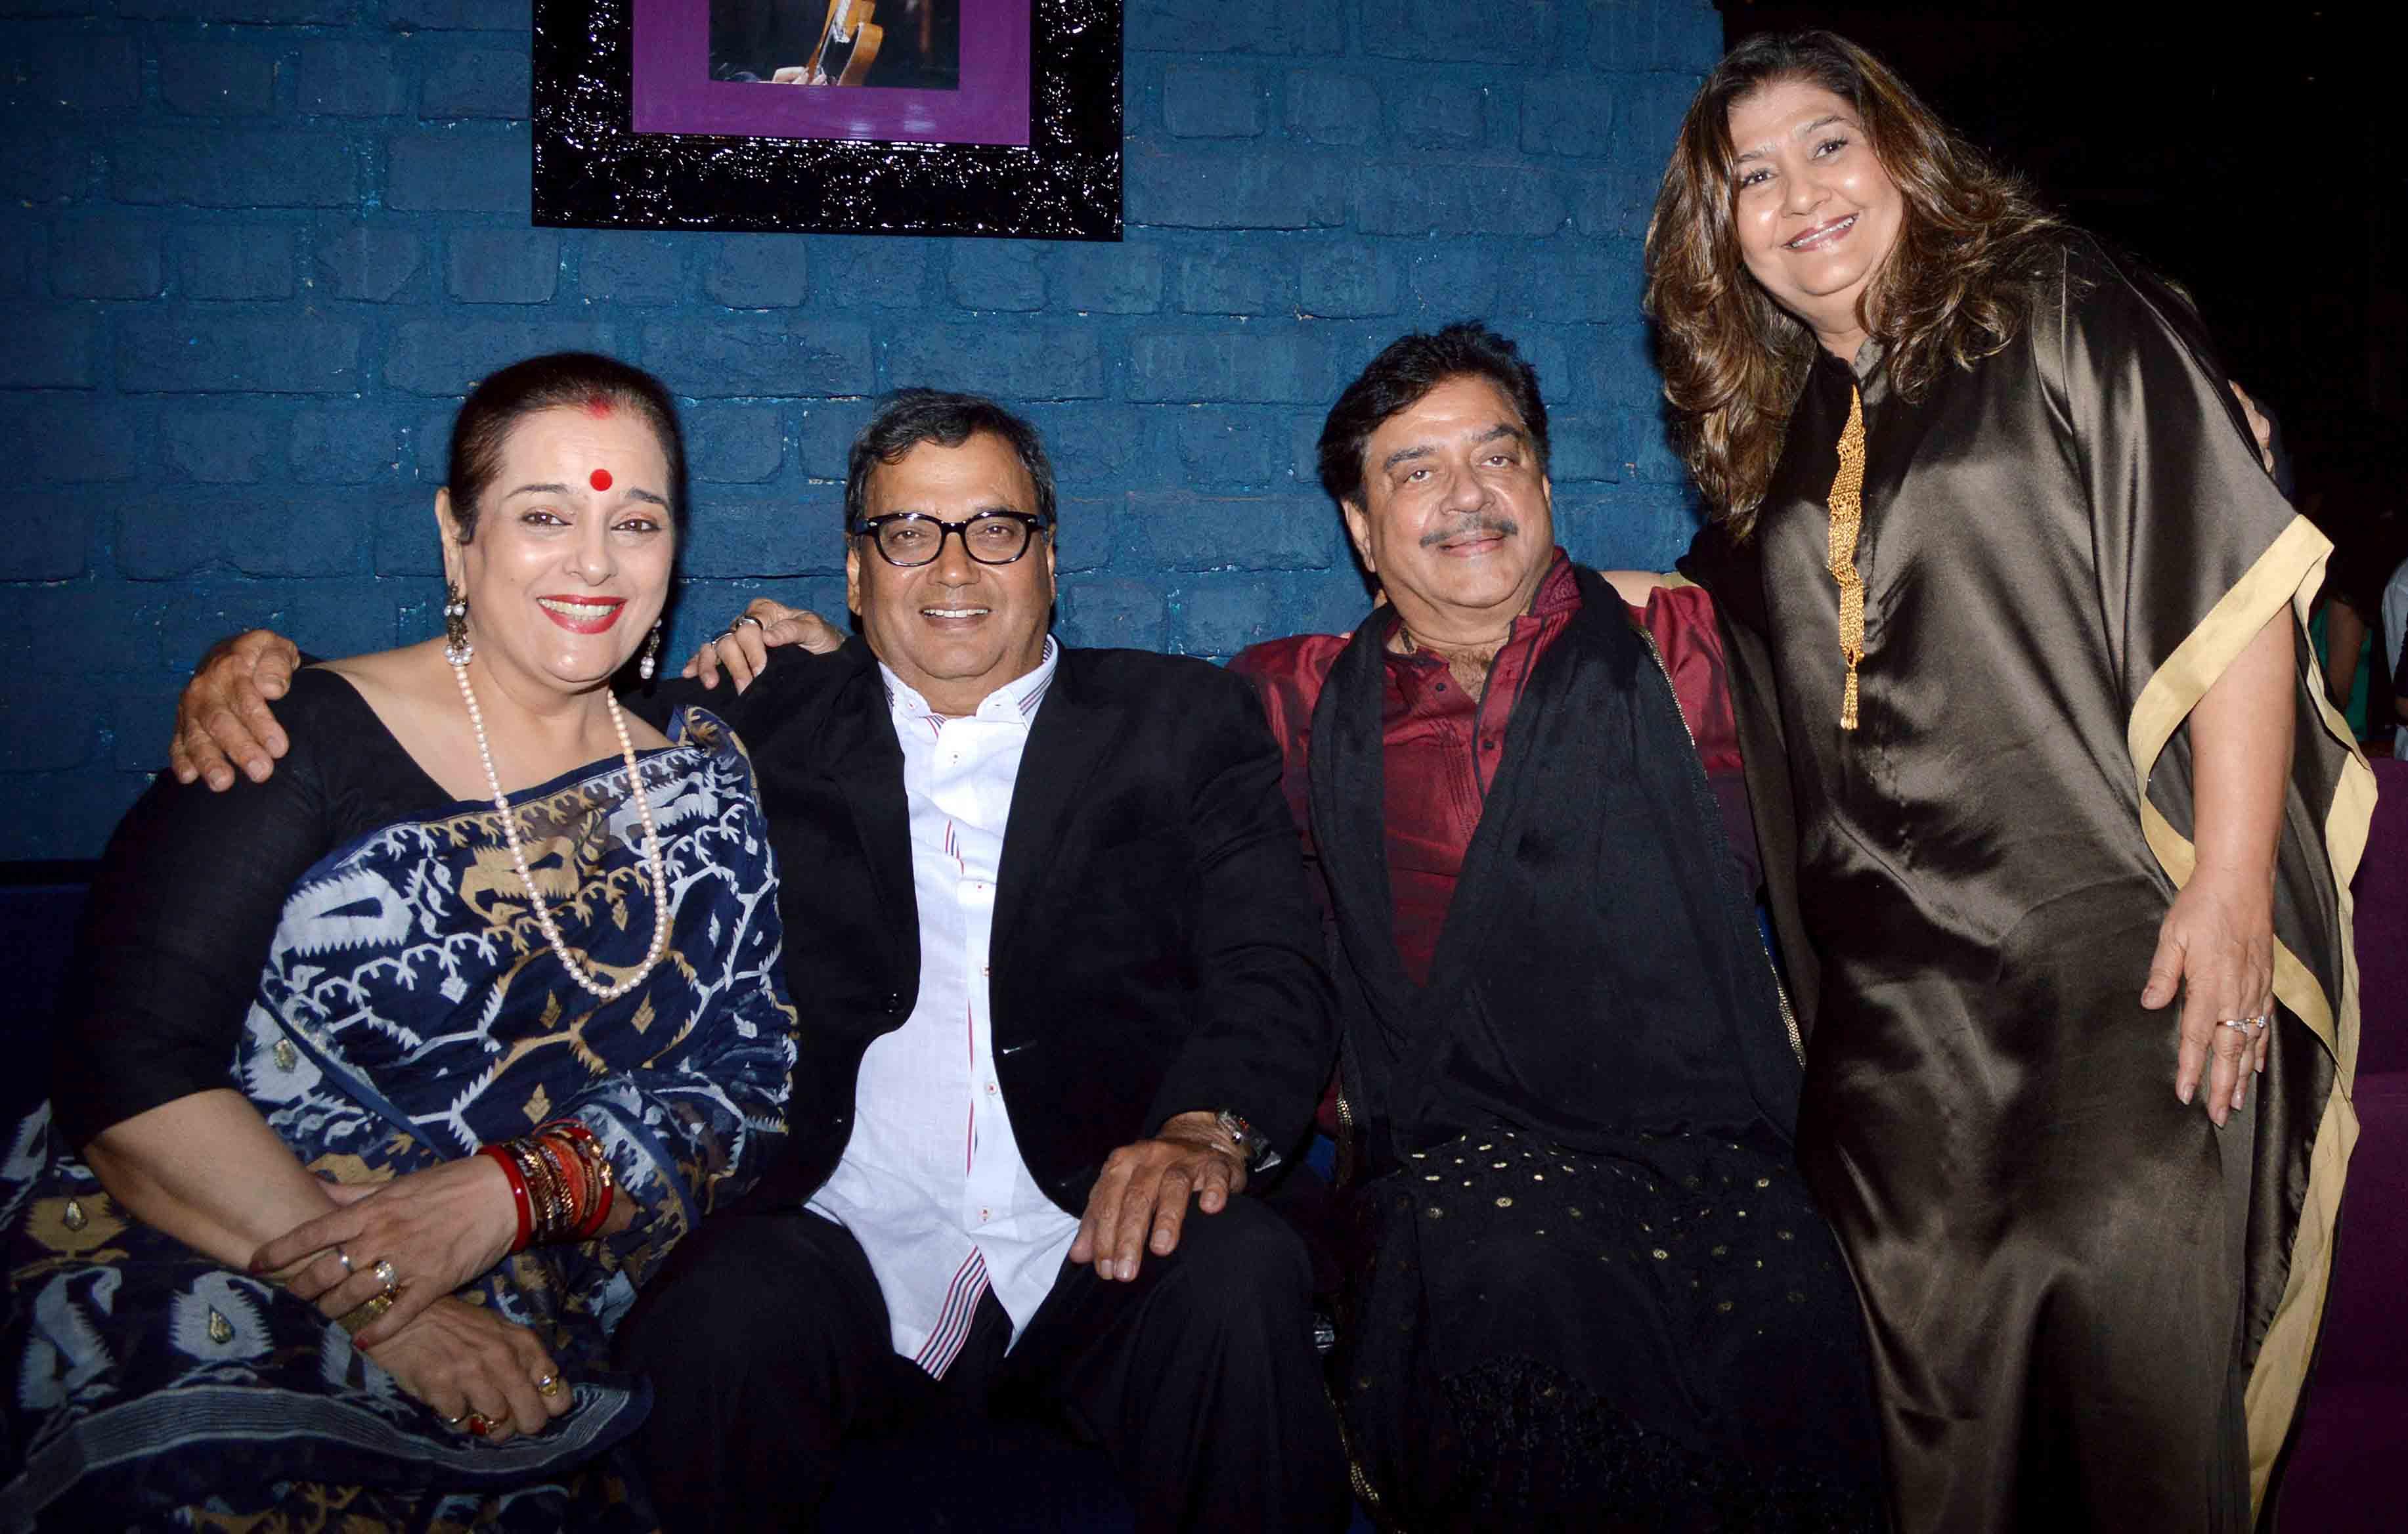 Subhash Ghai with Shtrughnan and Poonam Sinha